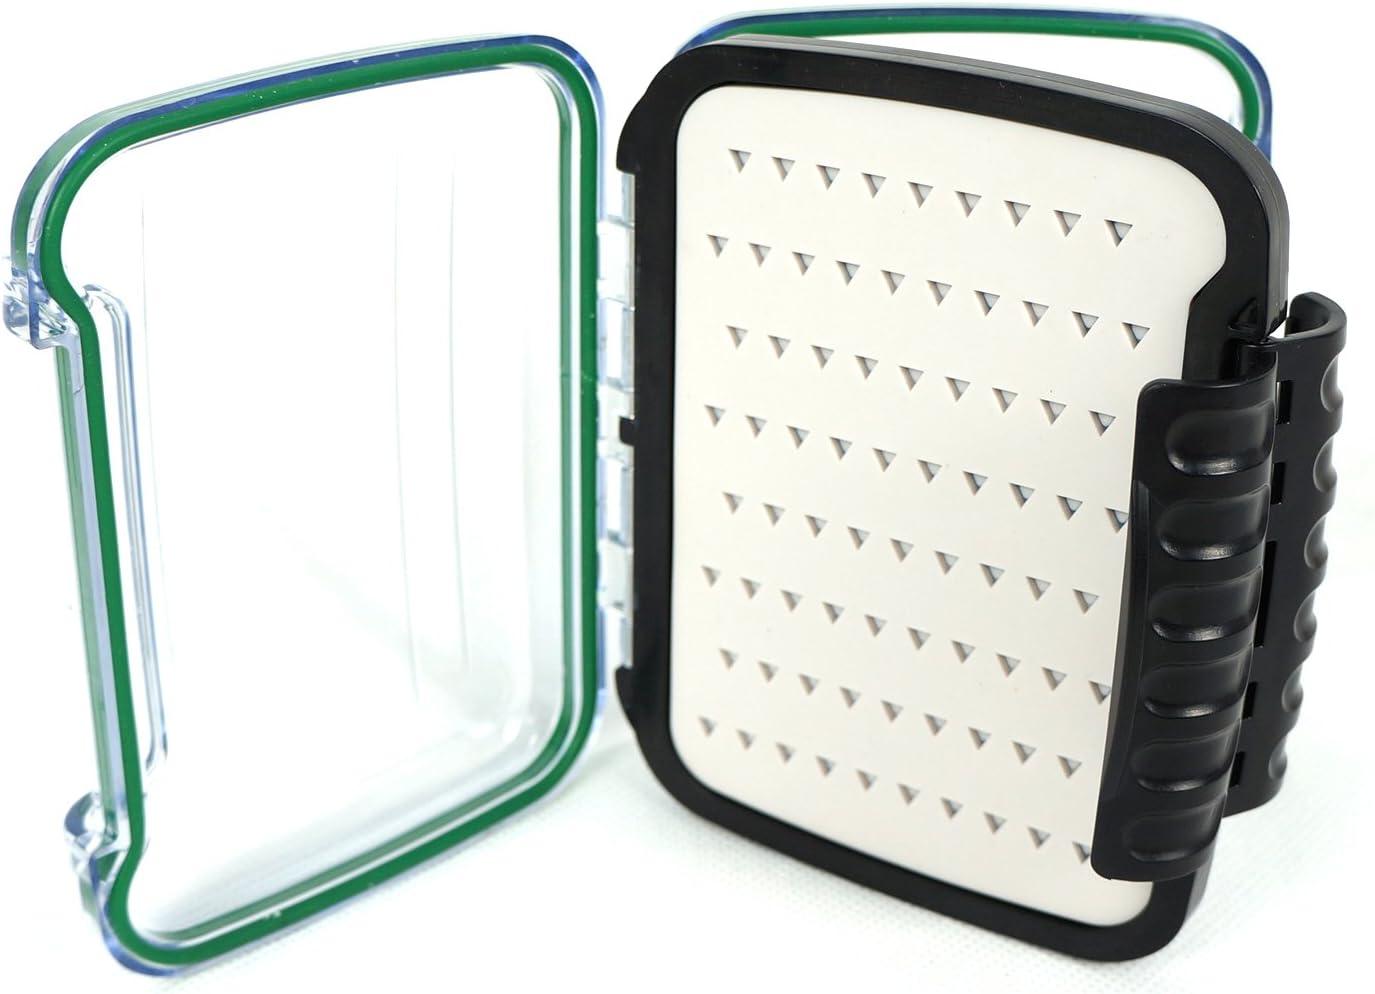 aventik inserciones de silicona doble cara caja de pesca con mosca ...